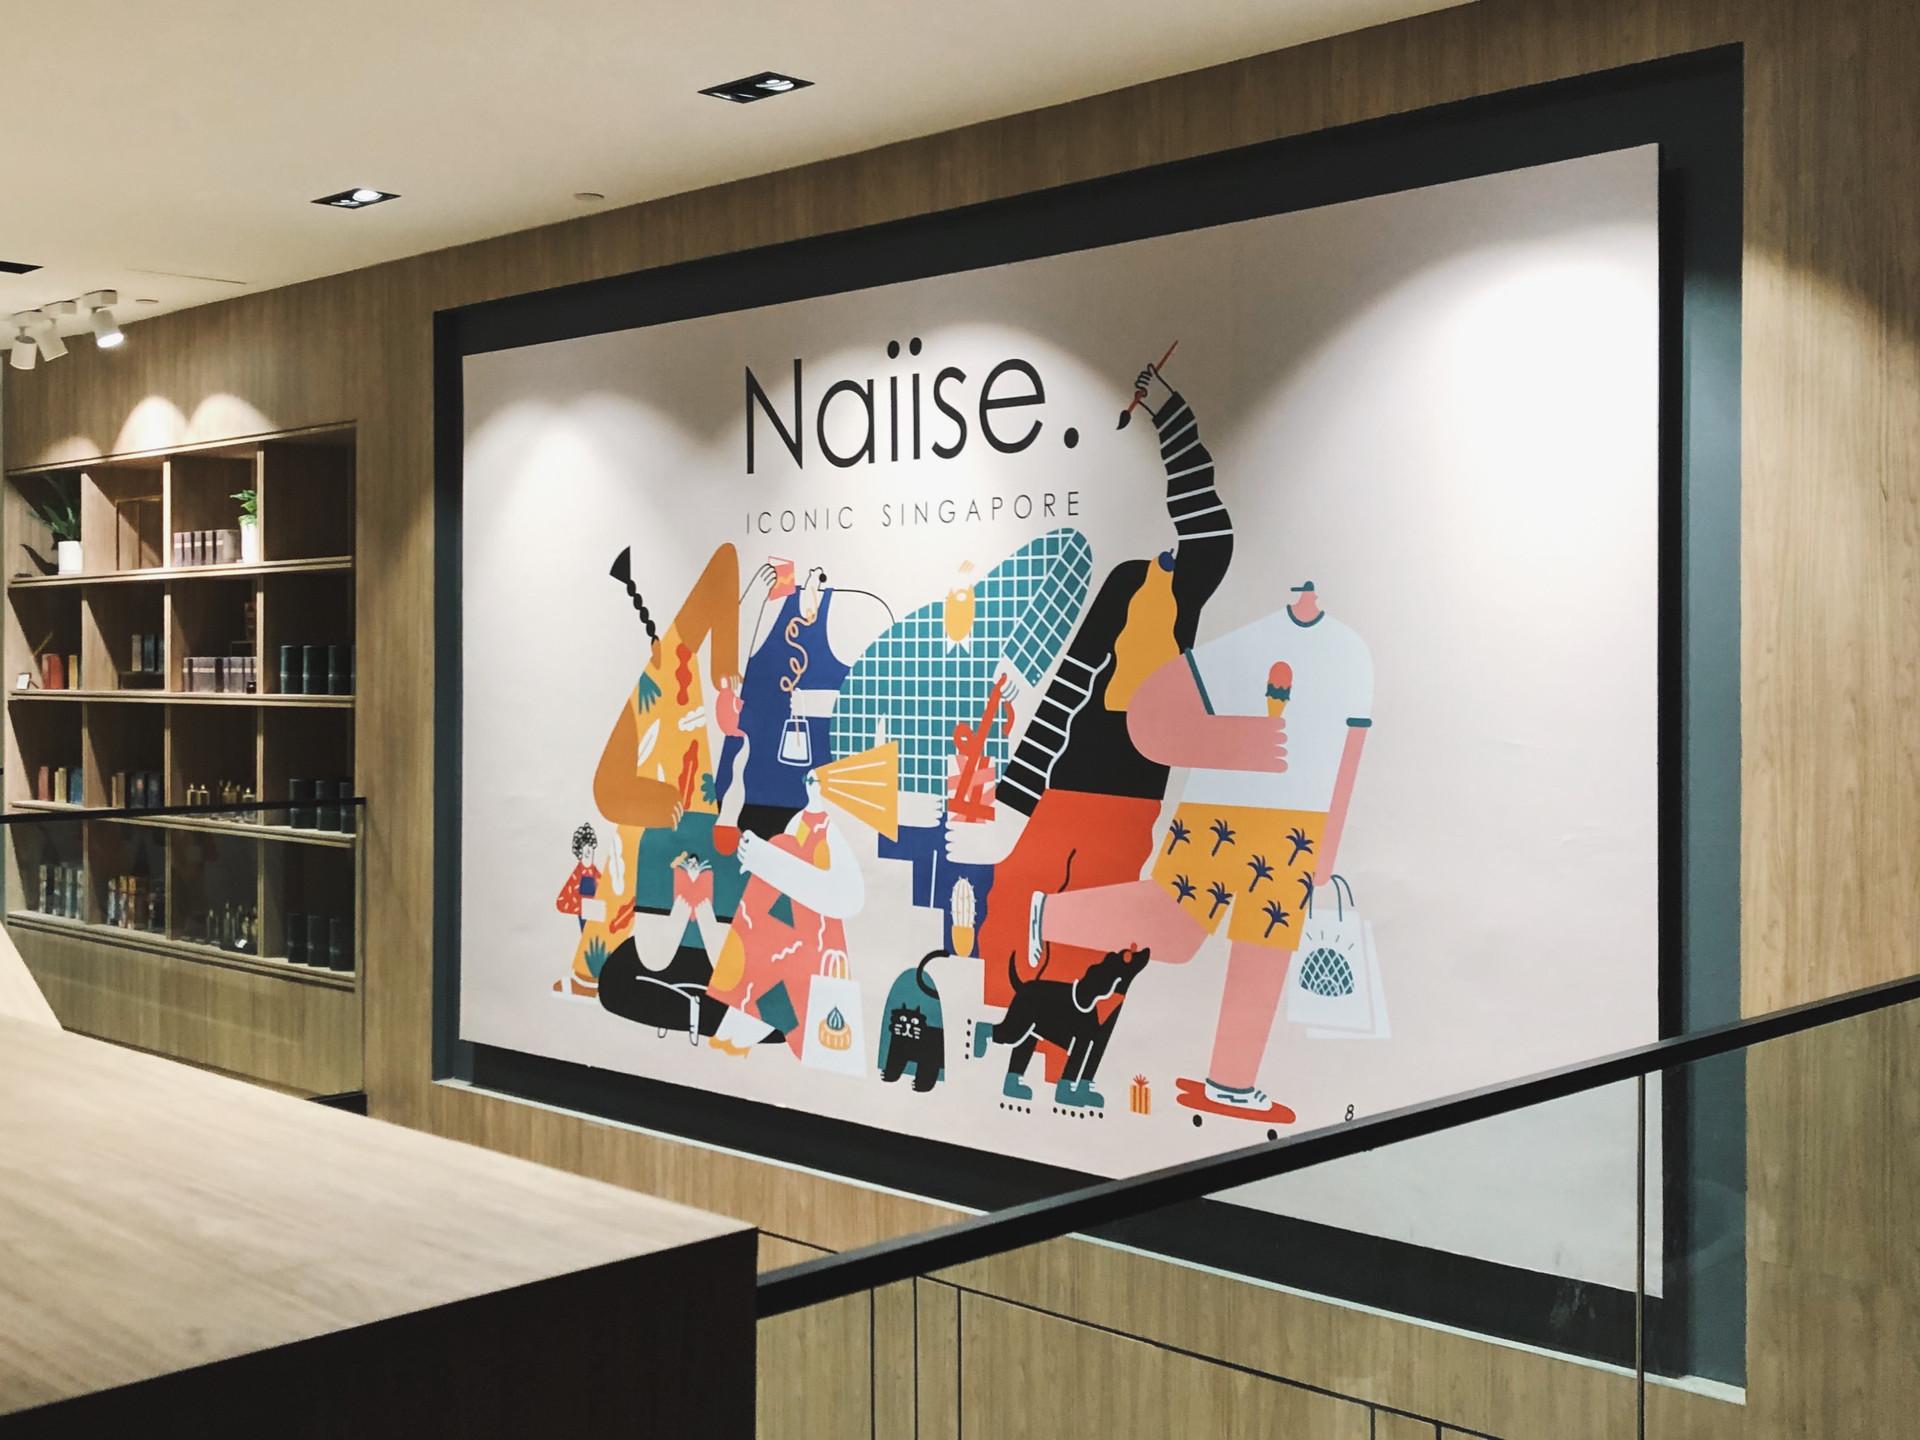 8ES_Naiise-Mural2.JPG